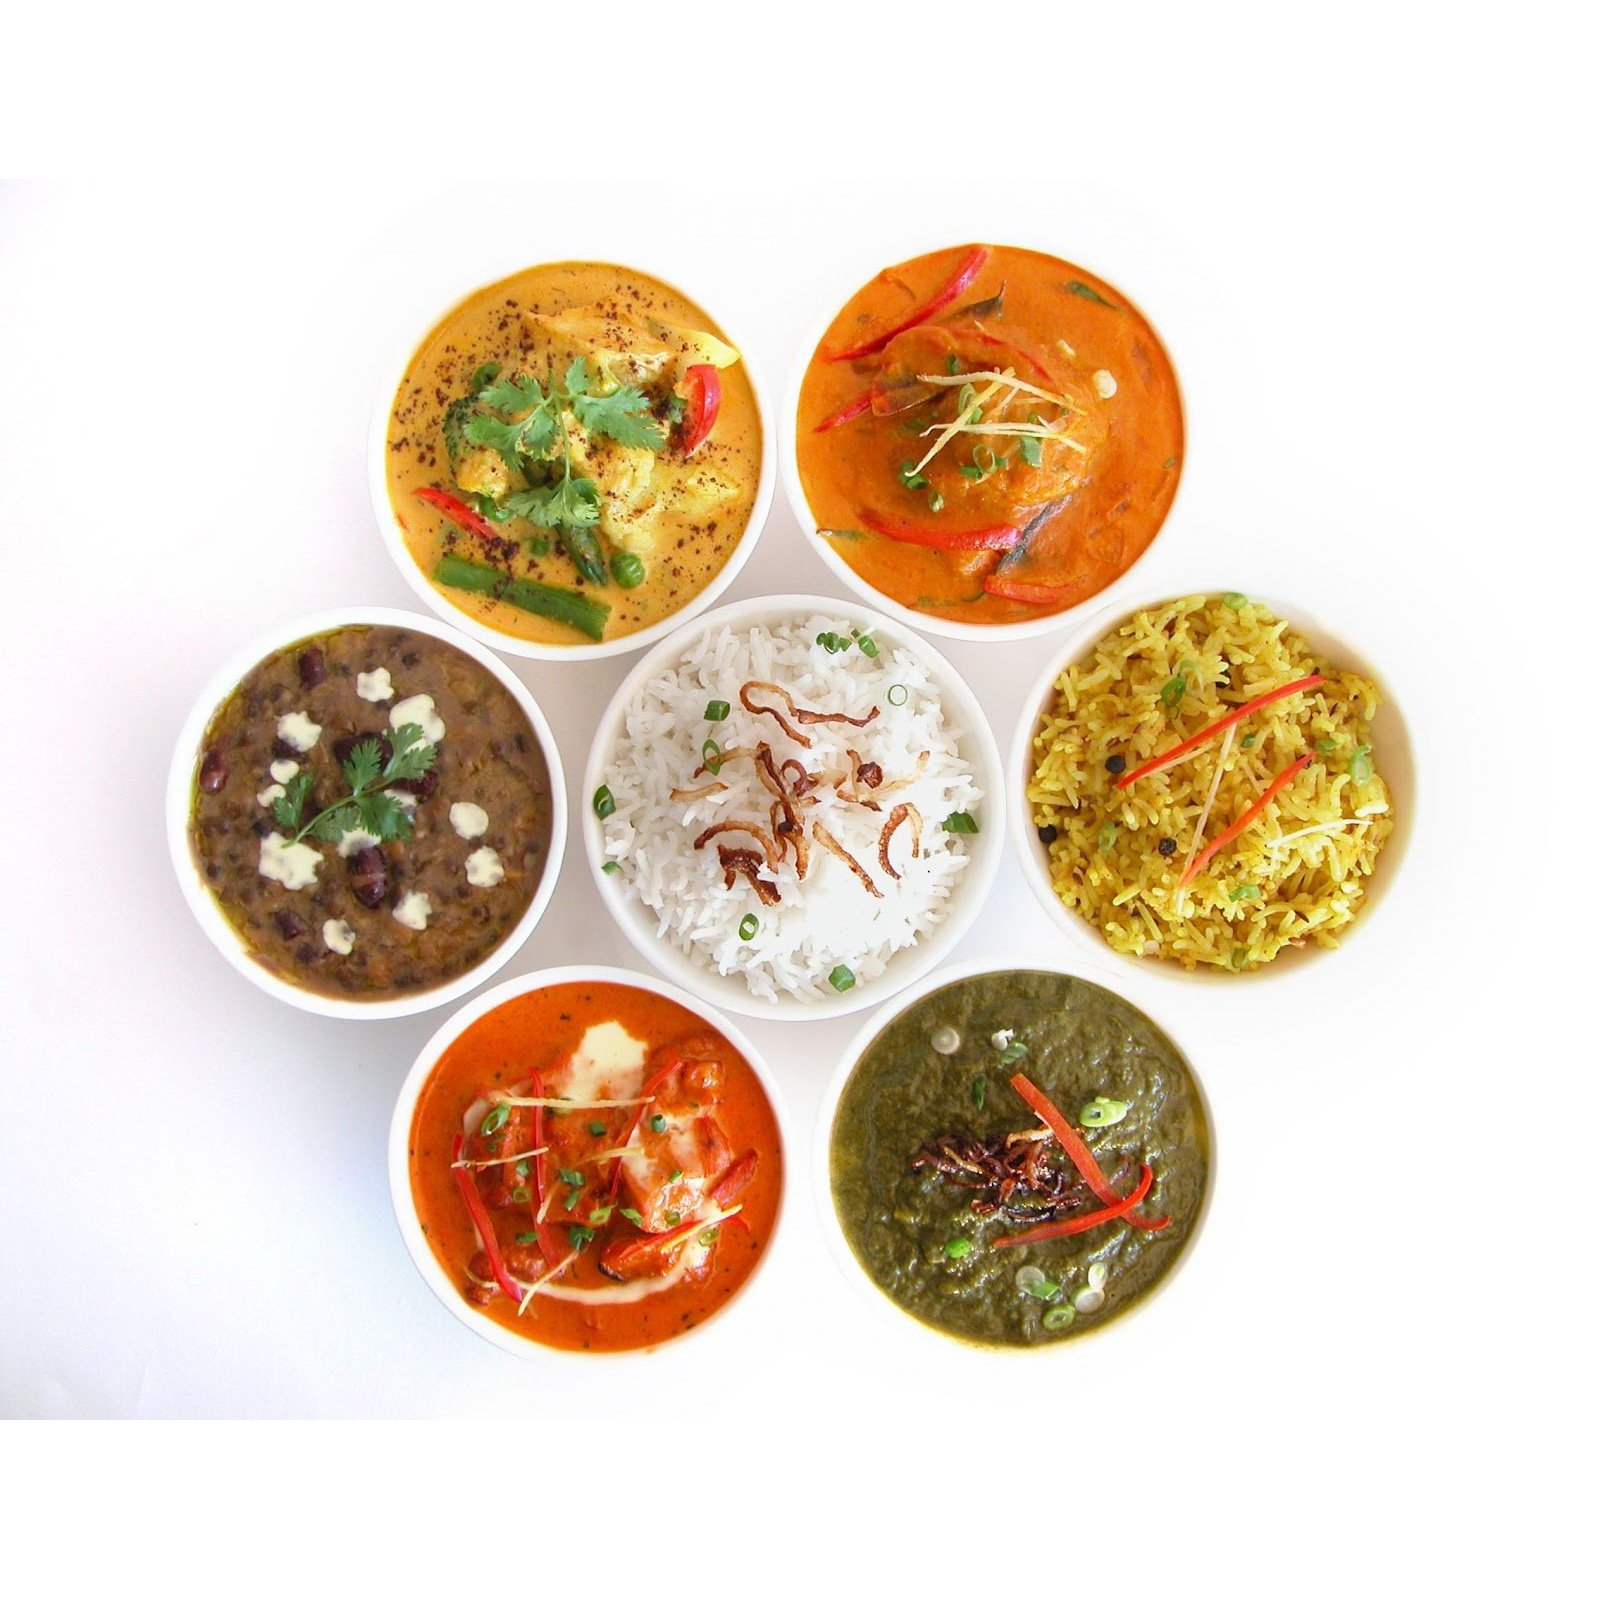 Ahana's Bombay Grille